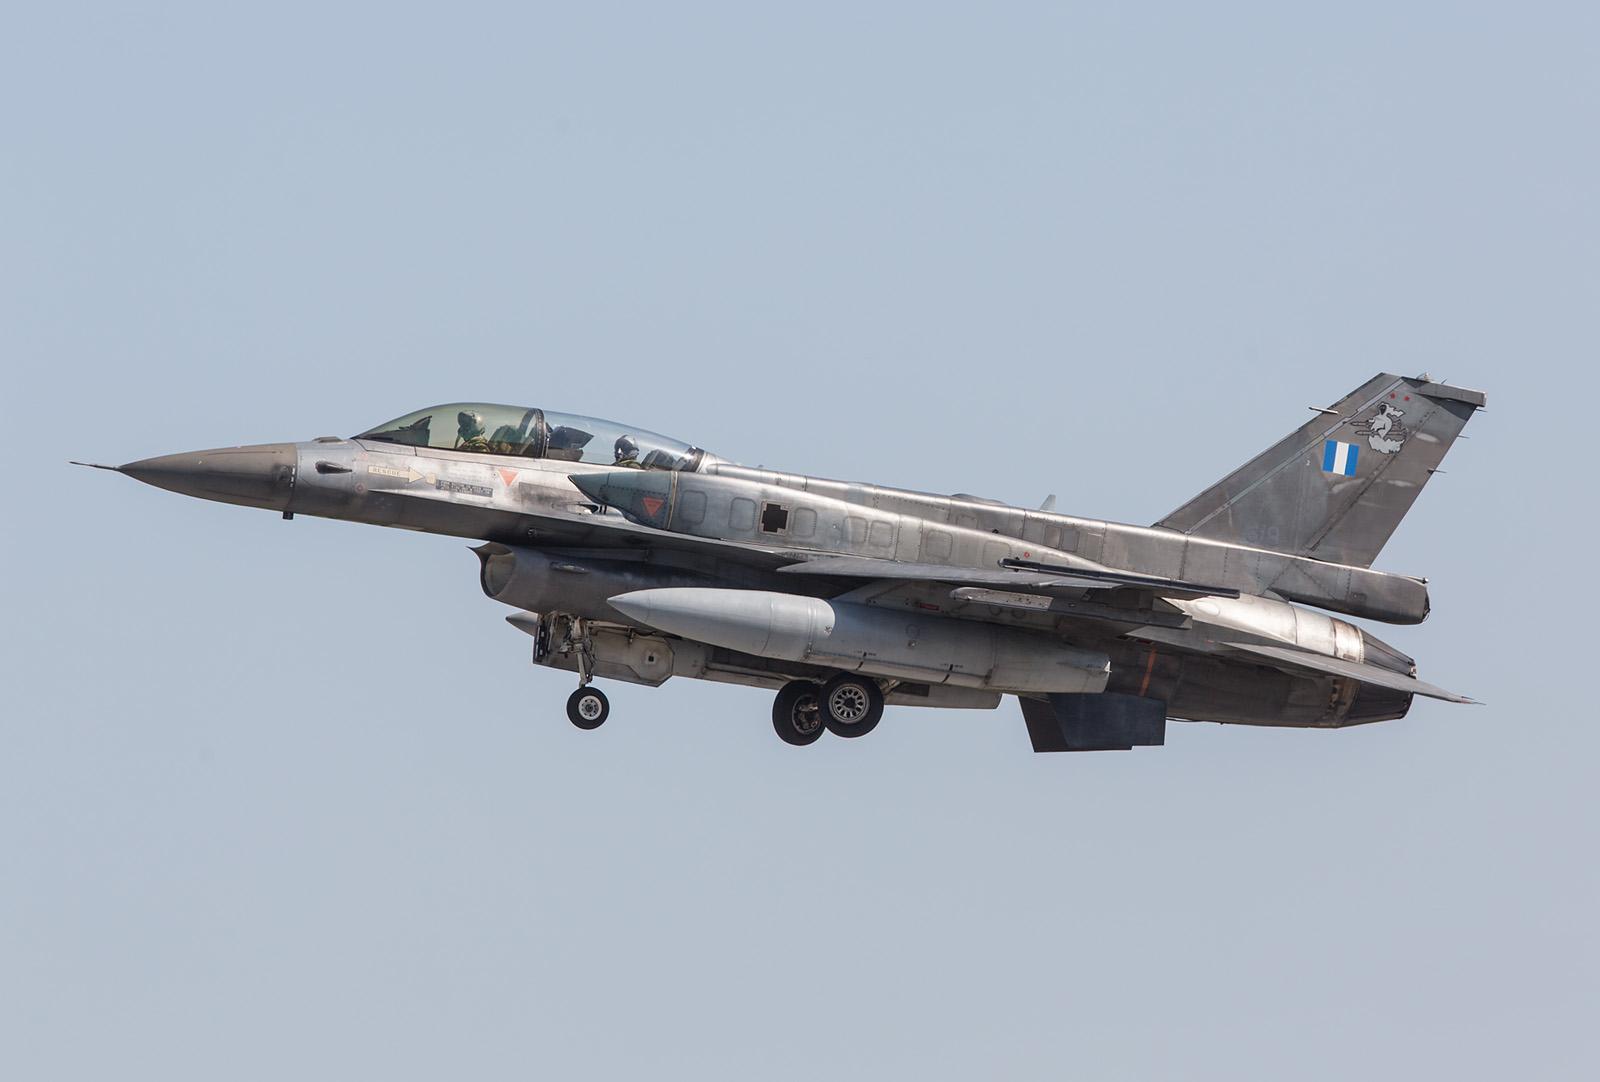 Doppelsitzer F-16D mit den Overwingtanks.